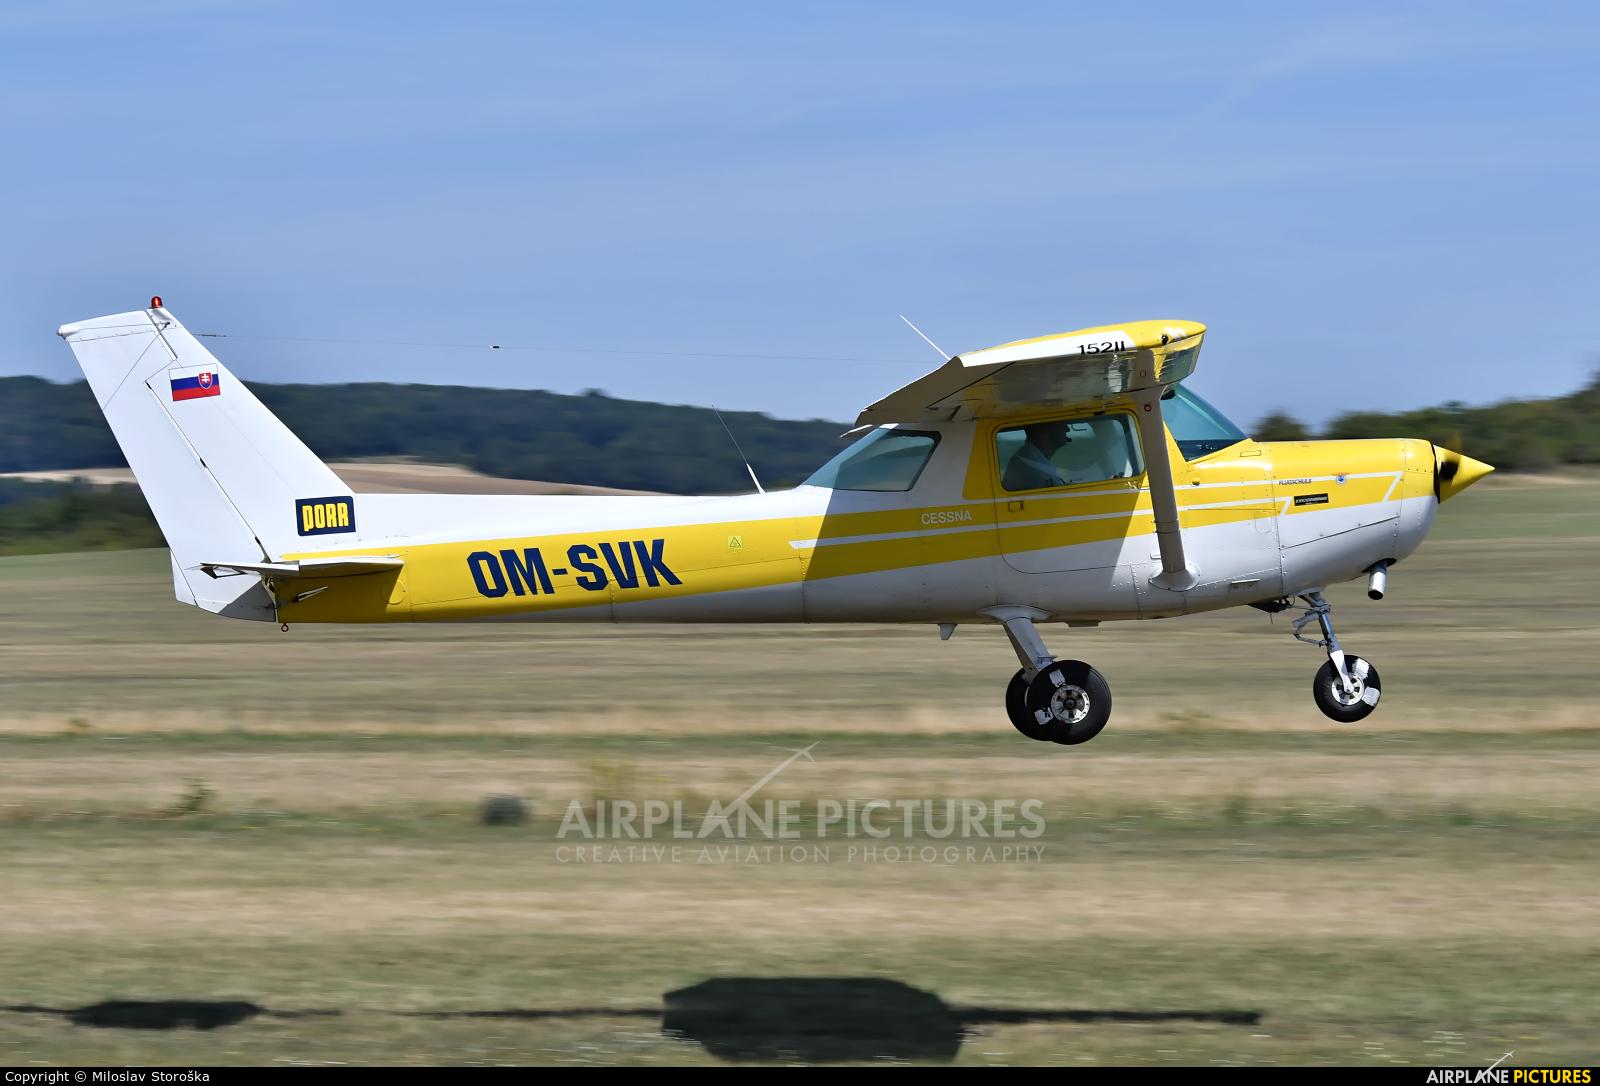 Aeroklub Trenčín OM-SVK aircraft at Spitzerberg